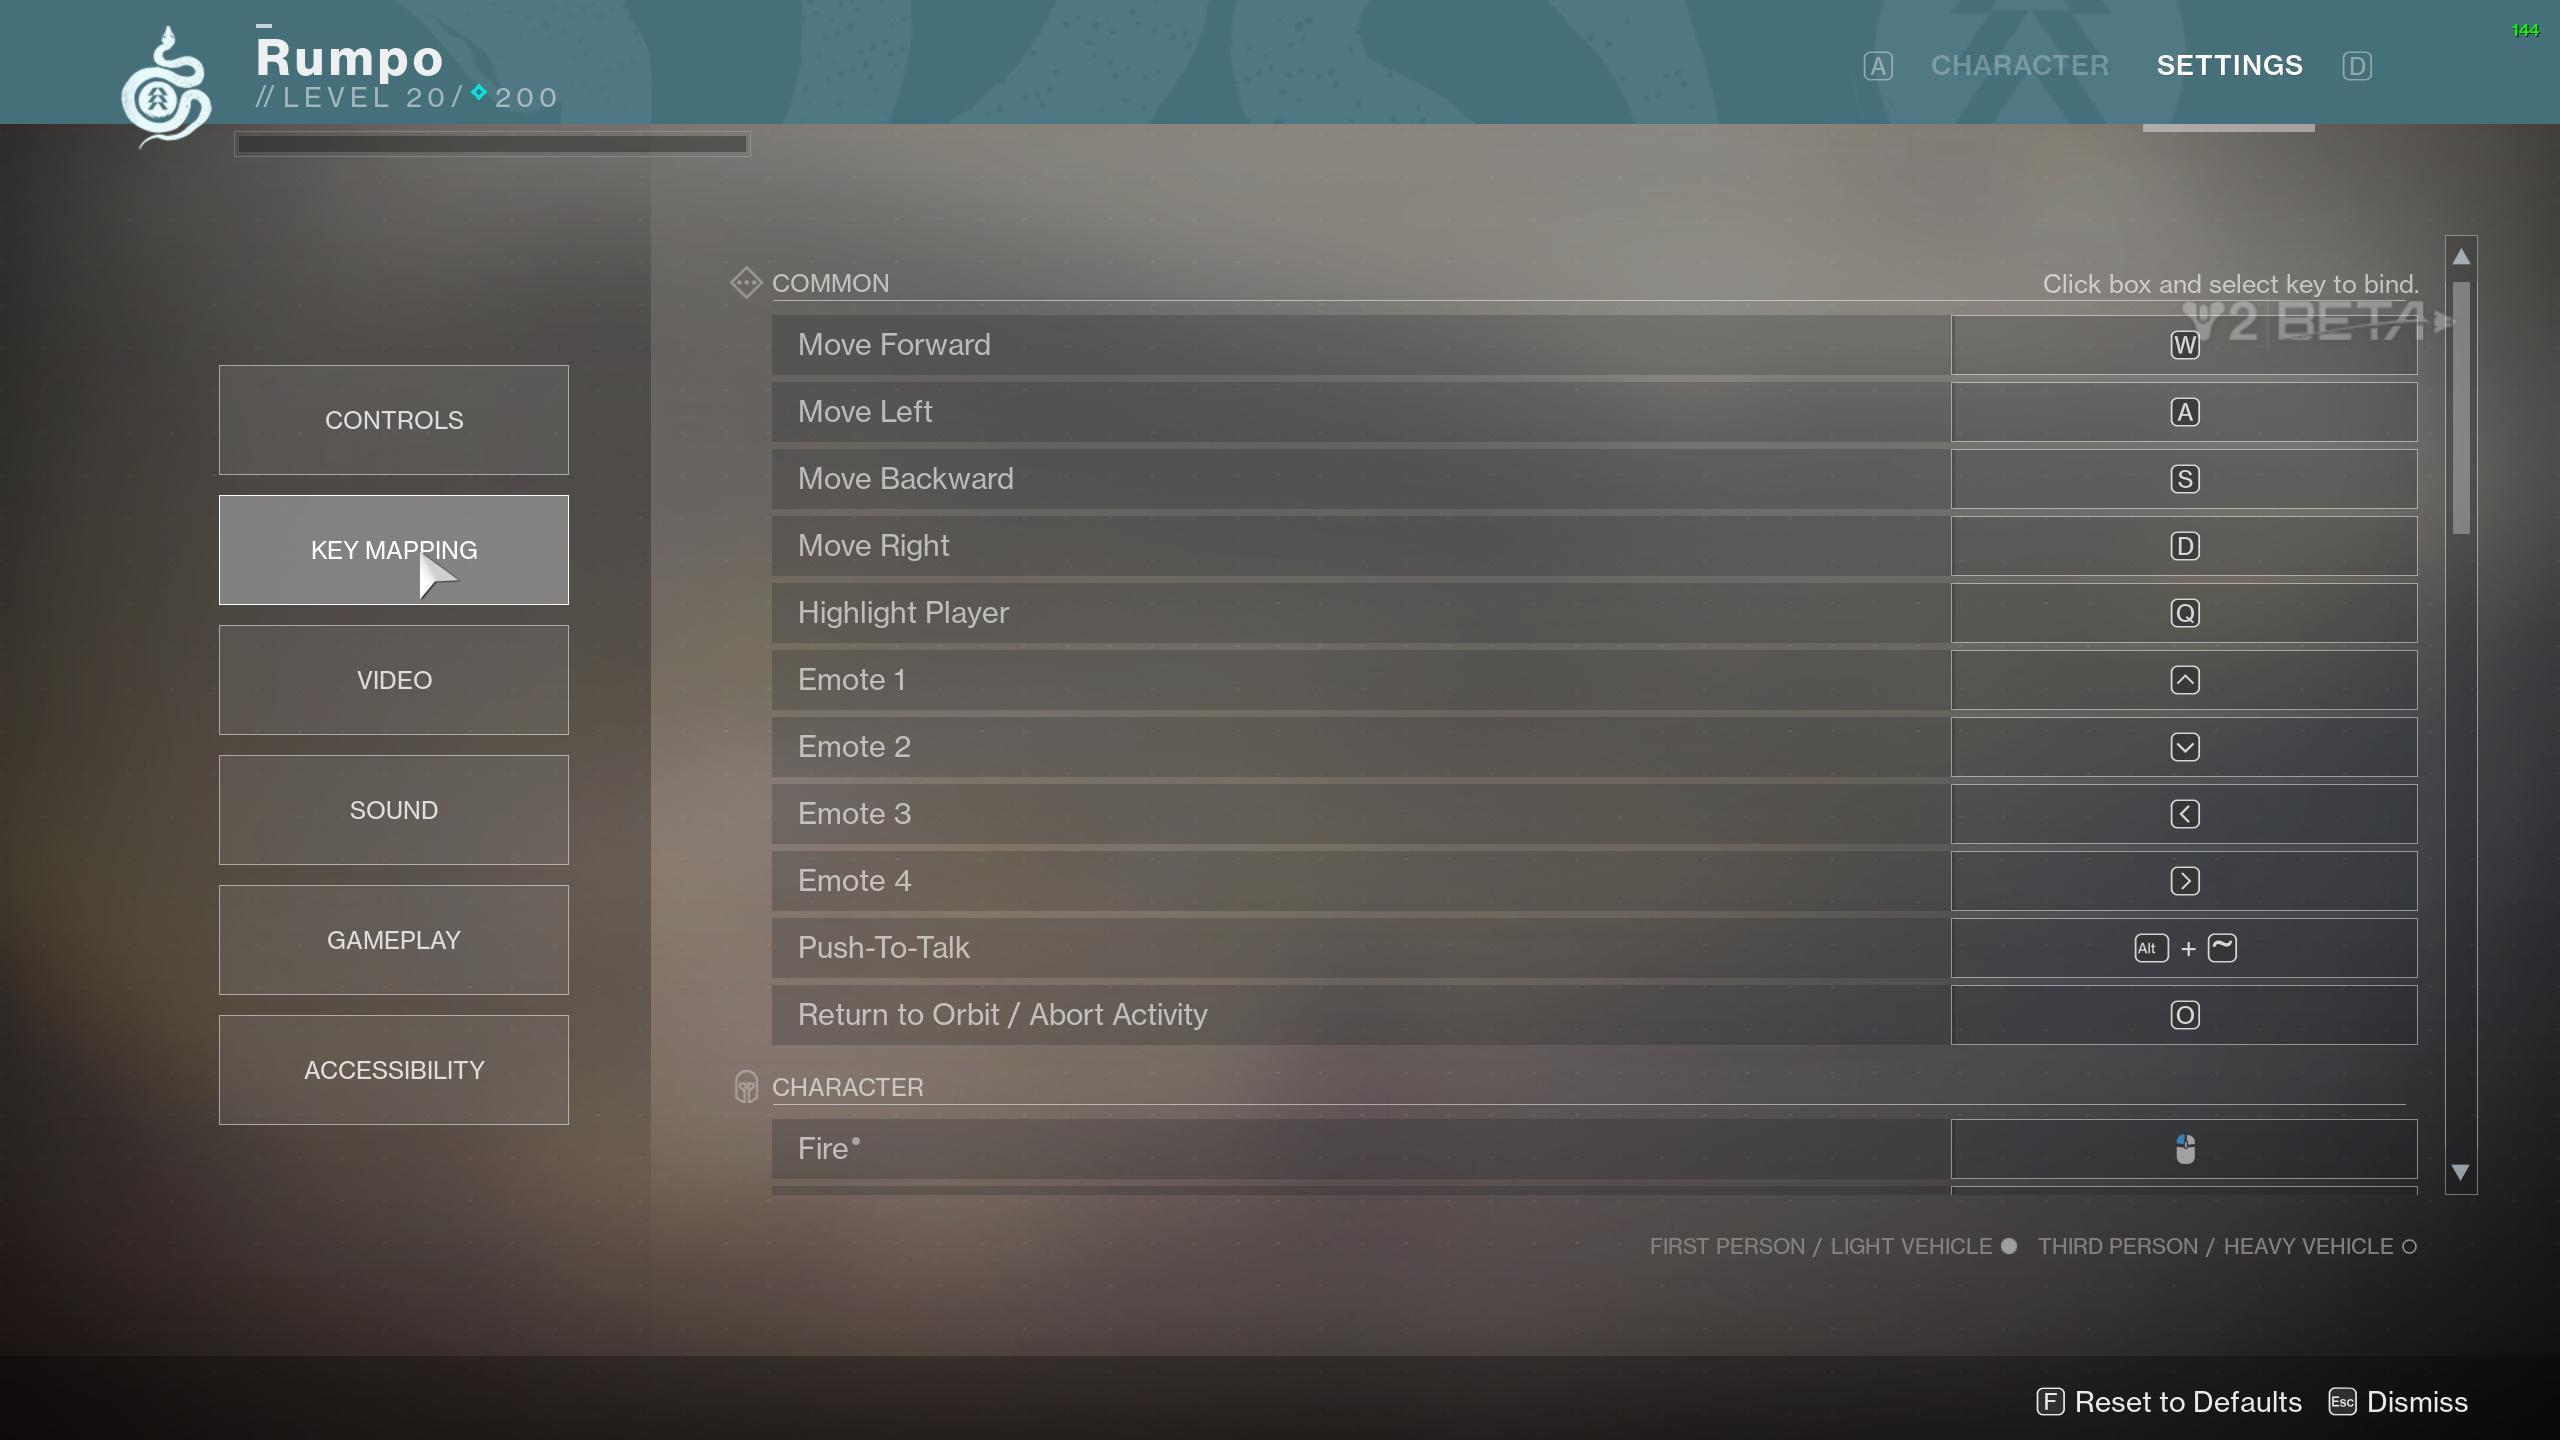 Destiny 2 key mappings